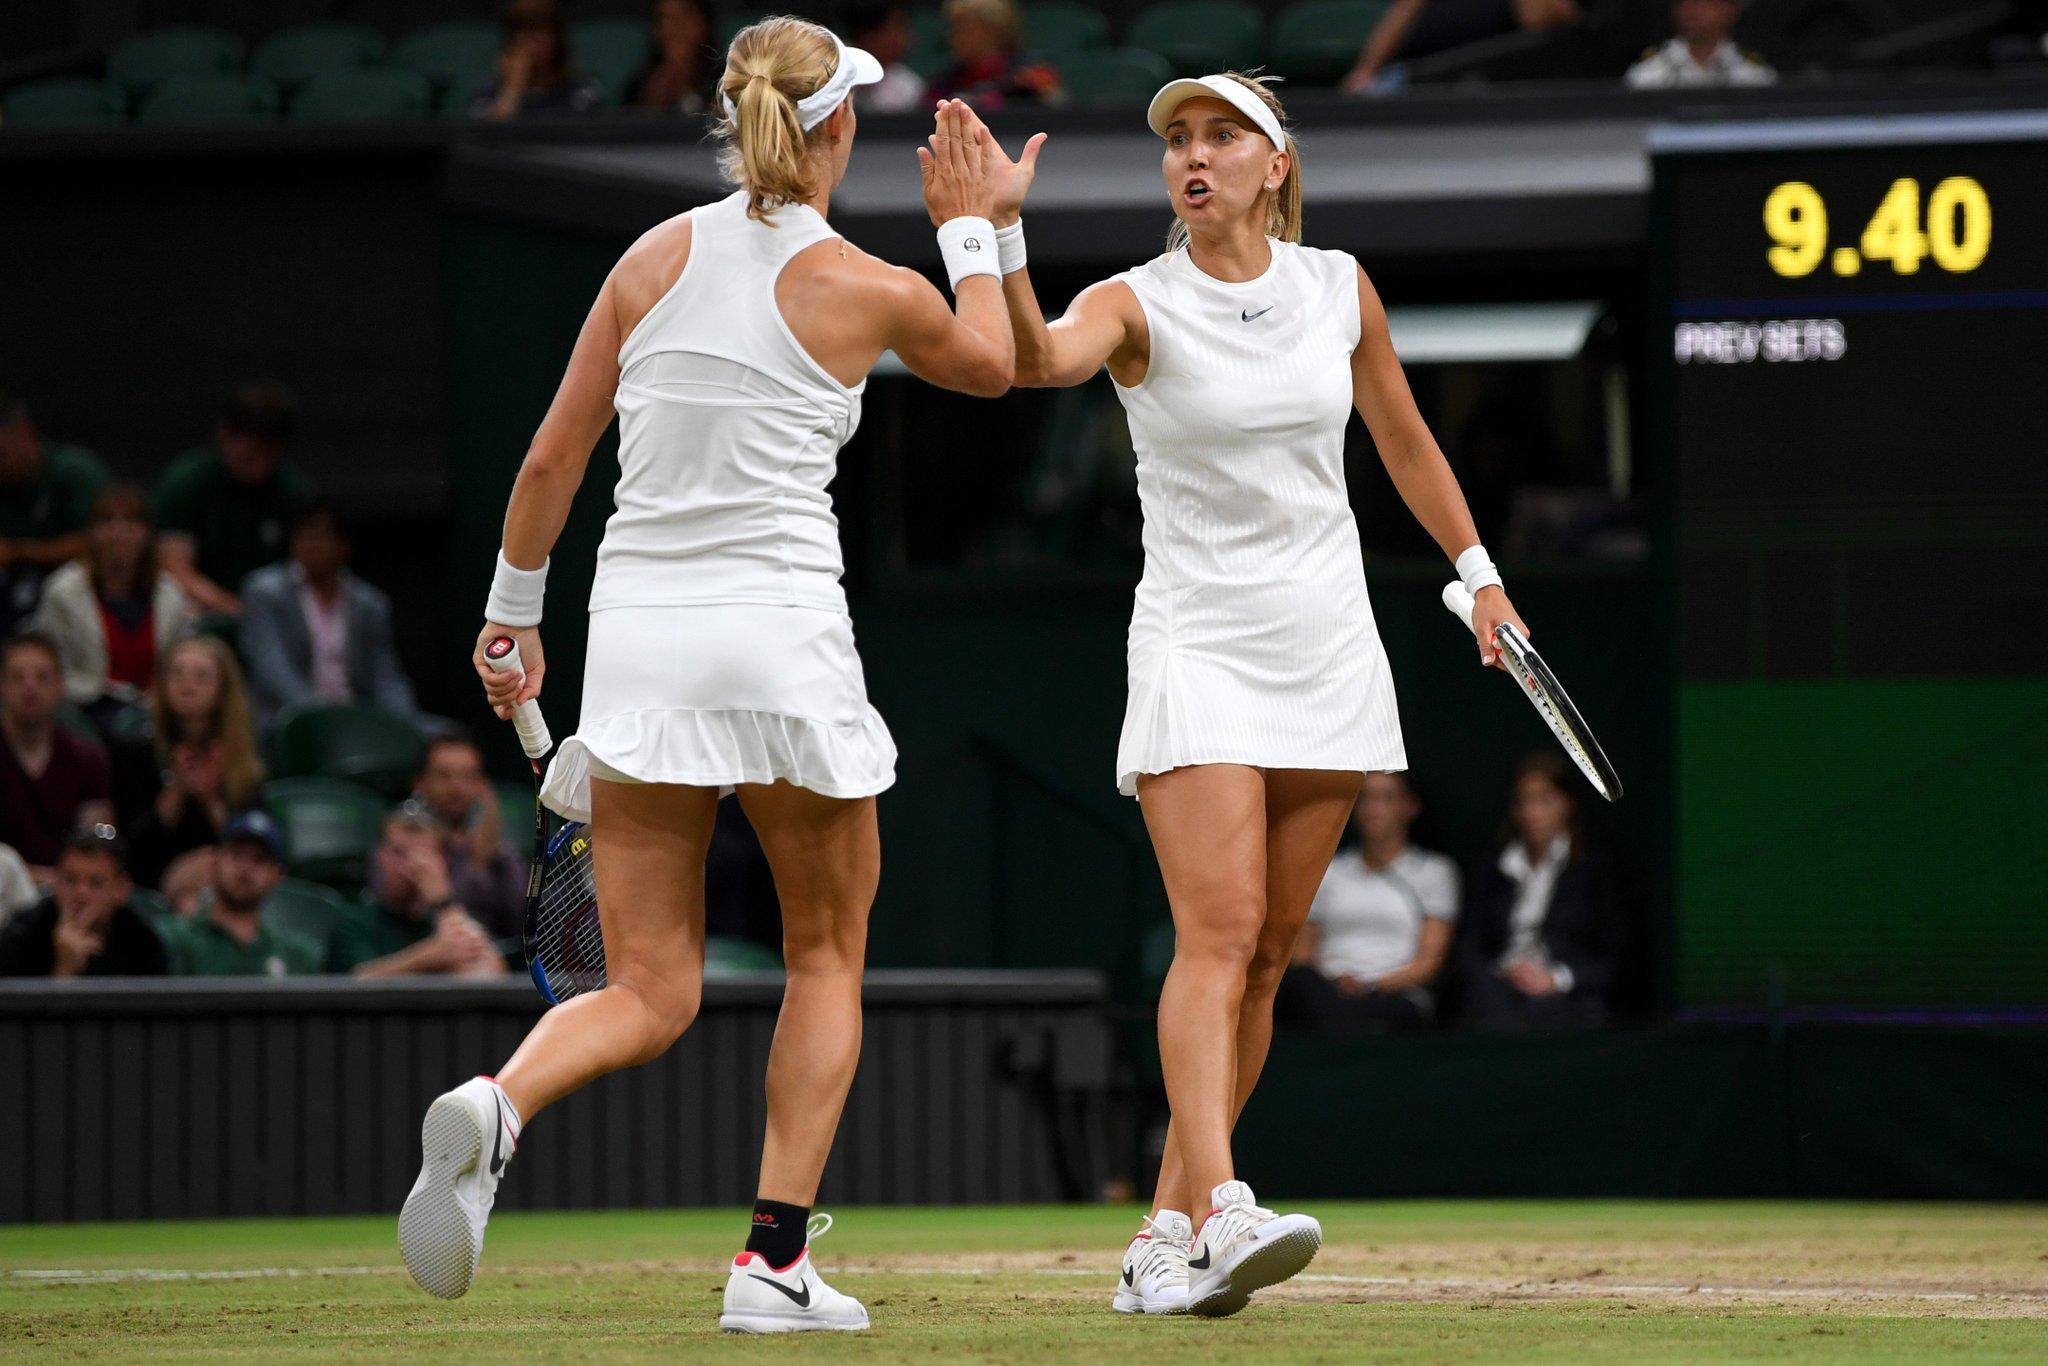 6-0. First set to Makarova and Vesnina.  ������  https://t.co/jiUsK2EKJG #Wimbledon #bbctennis https://t.co/z0x6zbNCwB